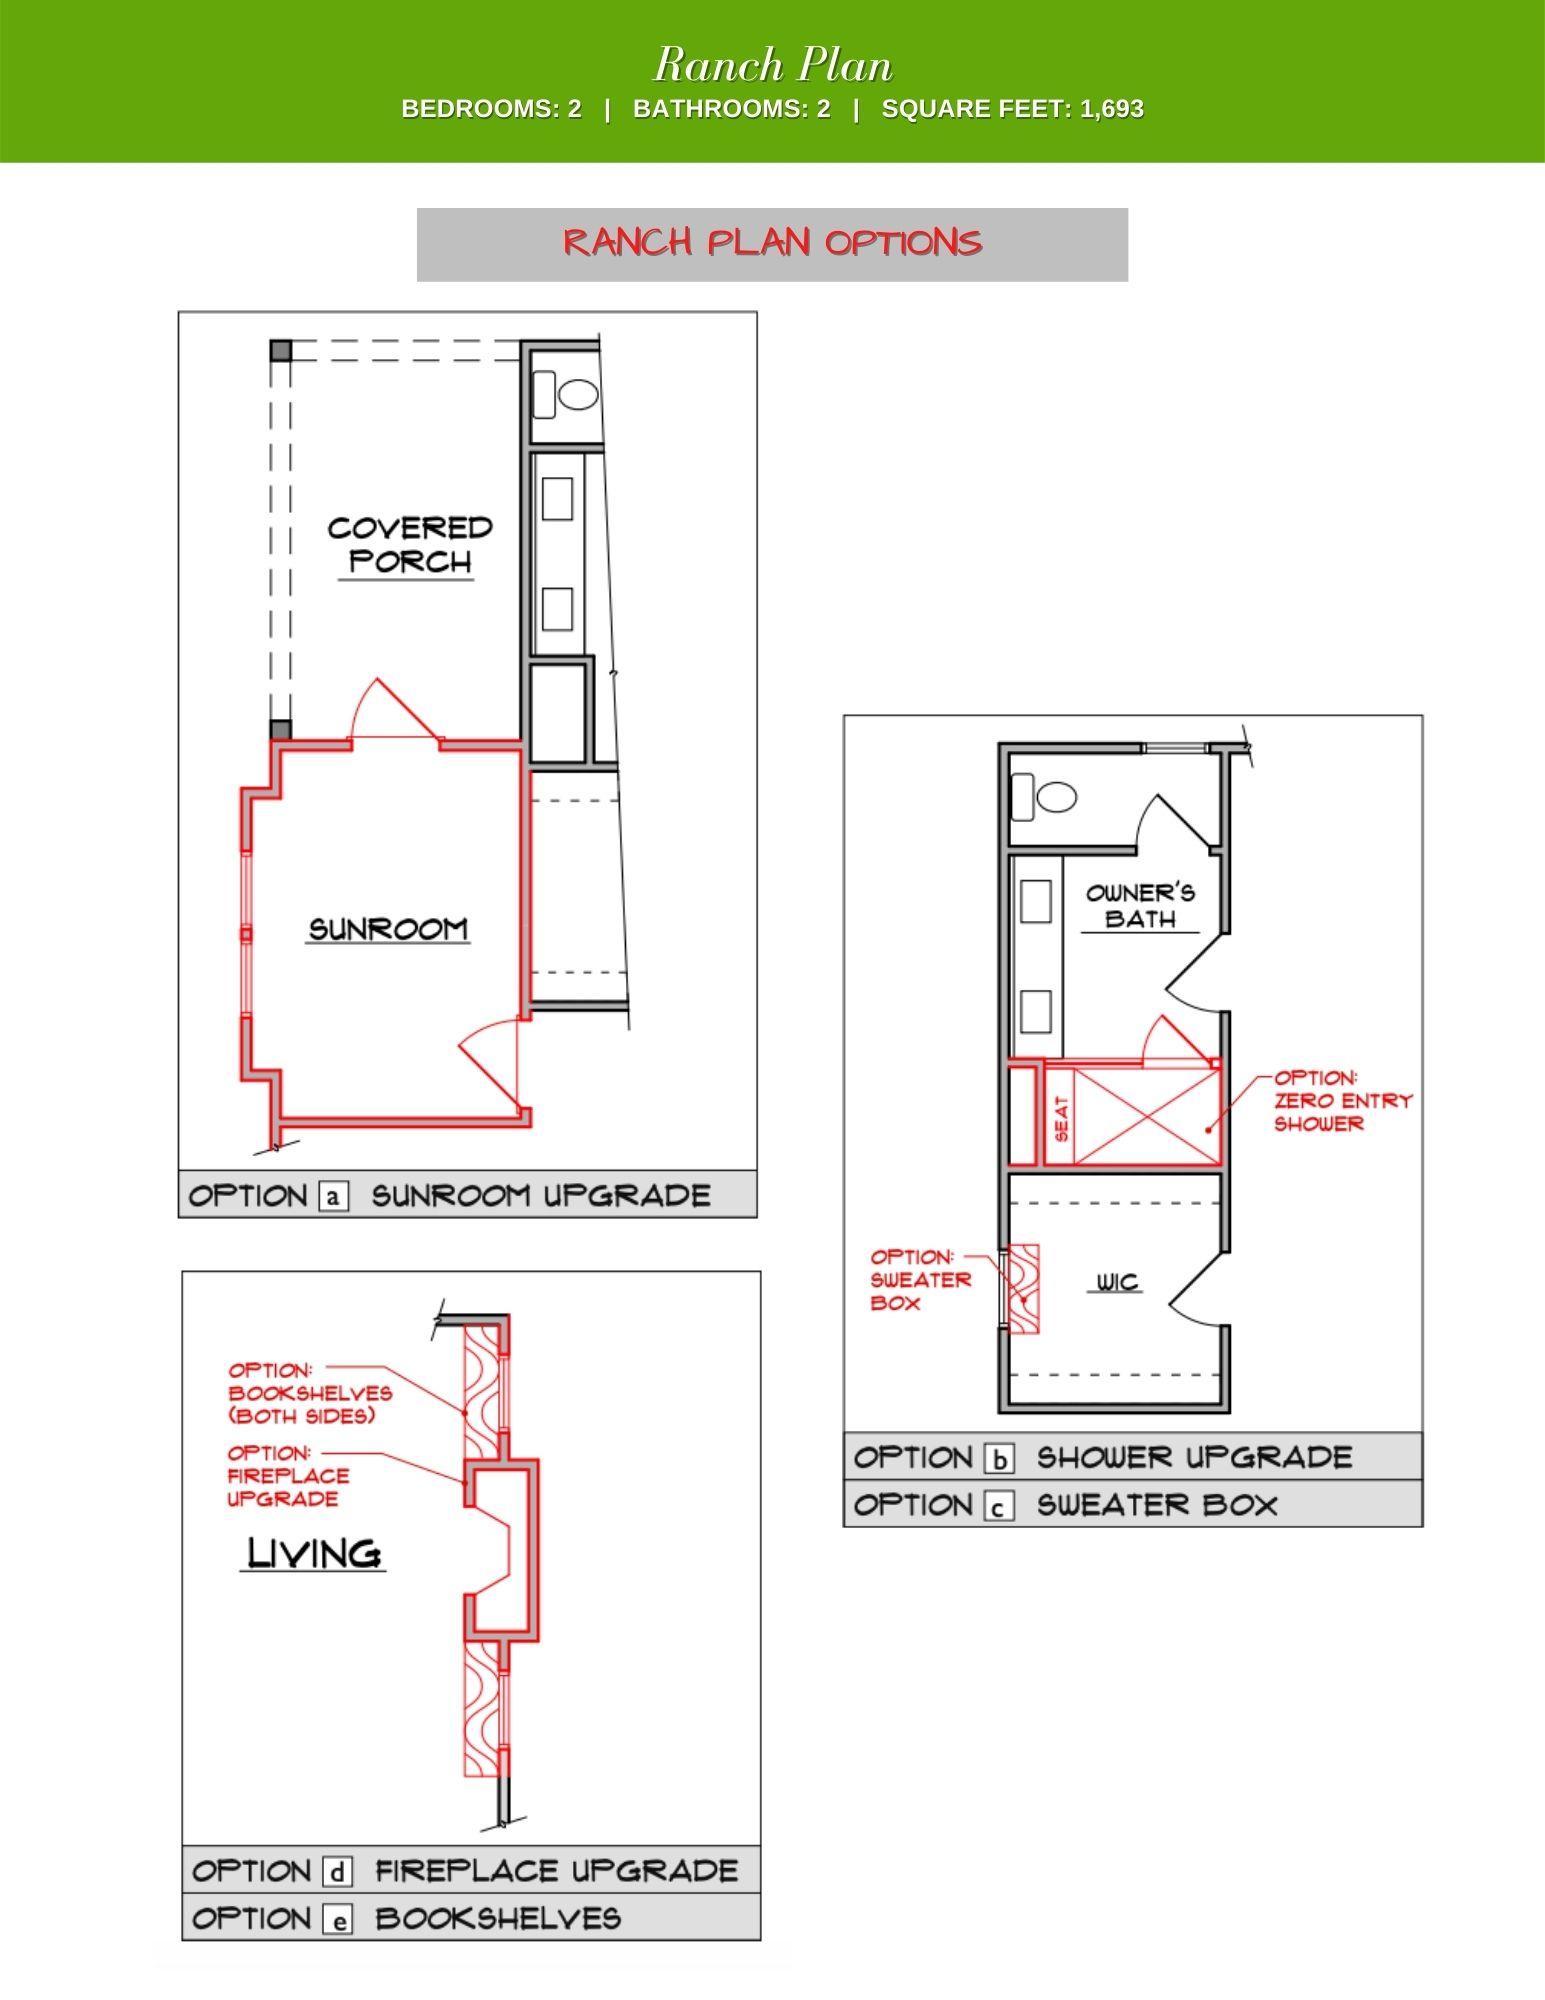 Redbud Plan Options